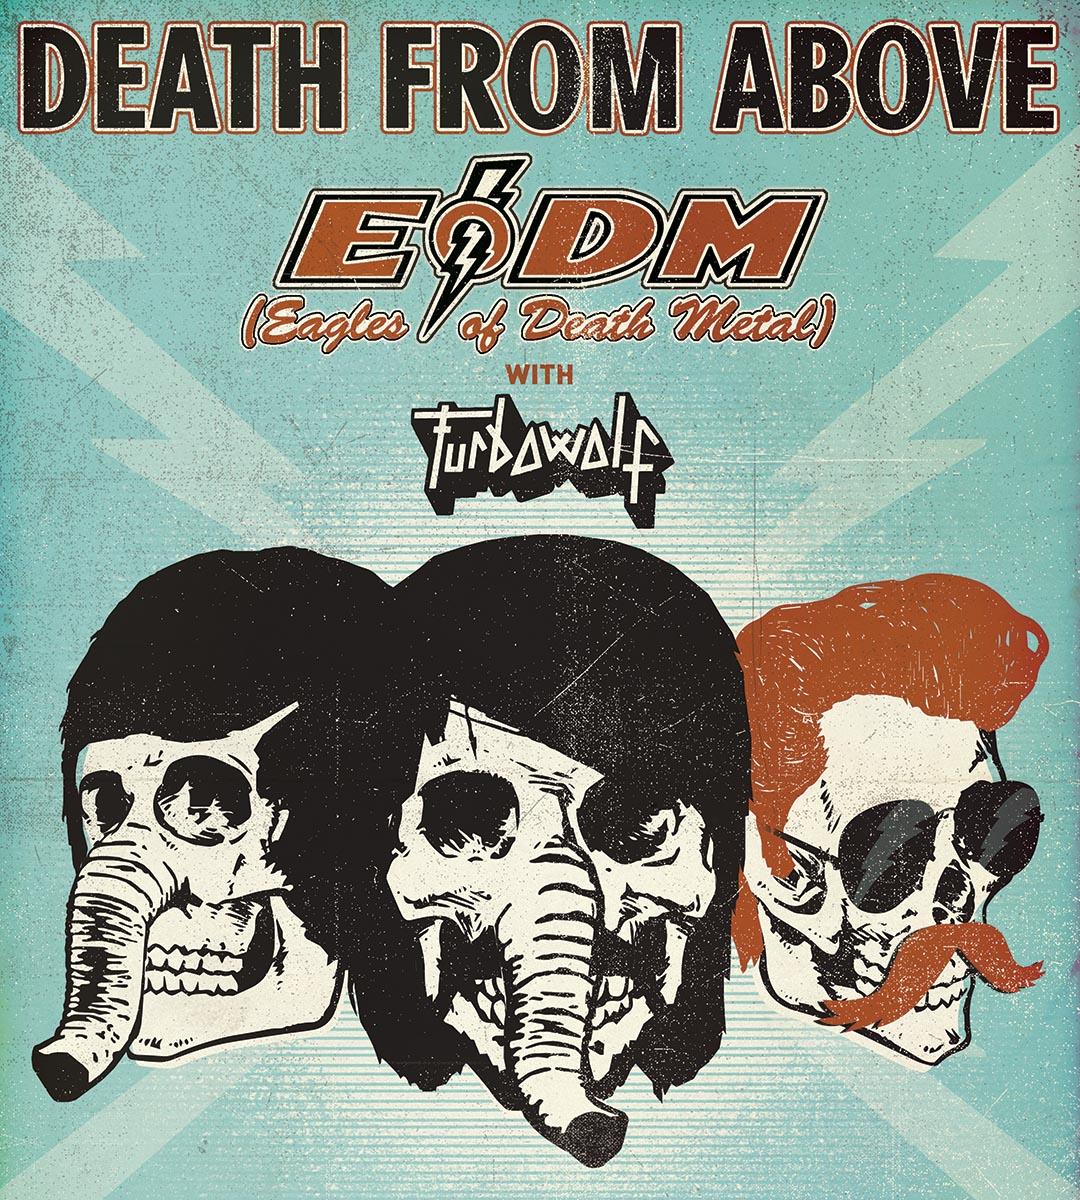 DeathFromAbove_EaglesofDeathMetal_sgT_COL_2